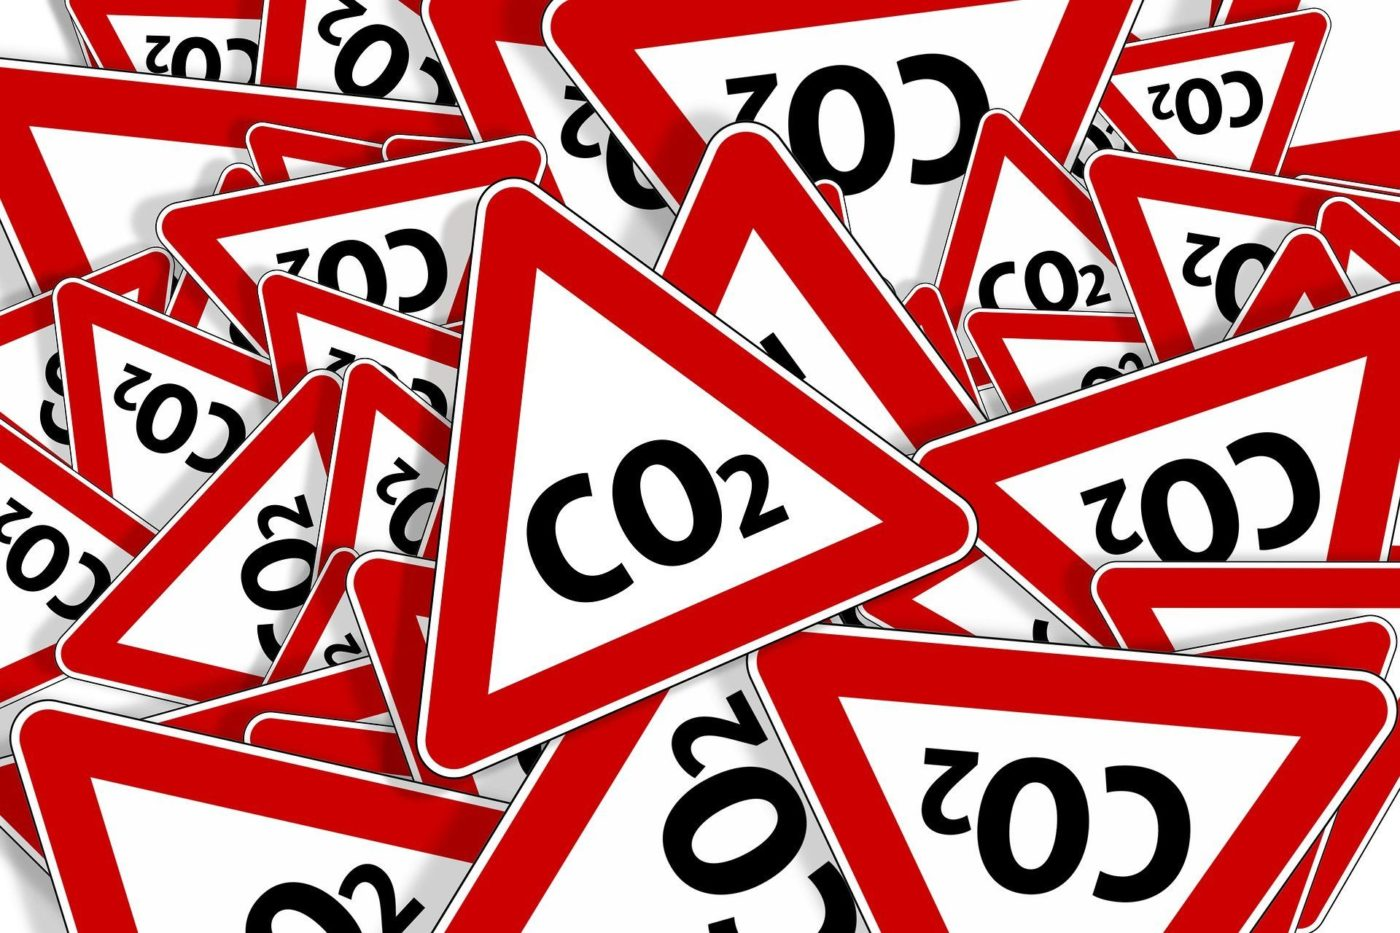 CO2 Deckel